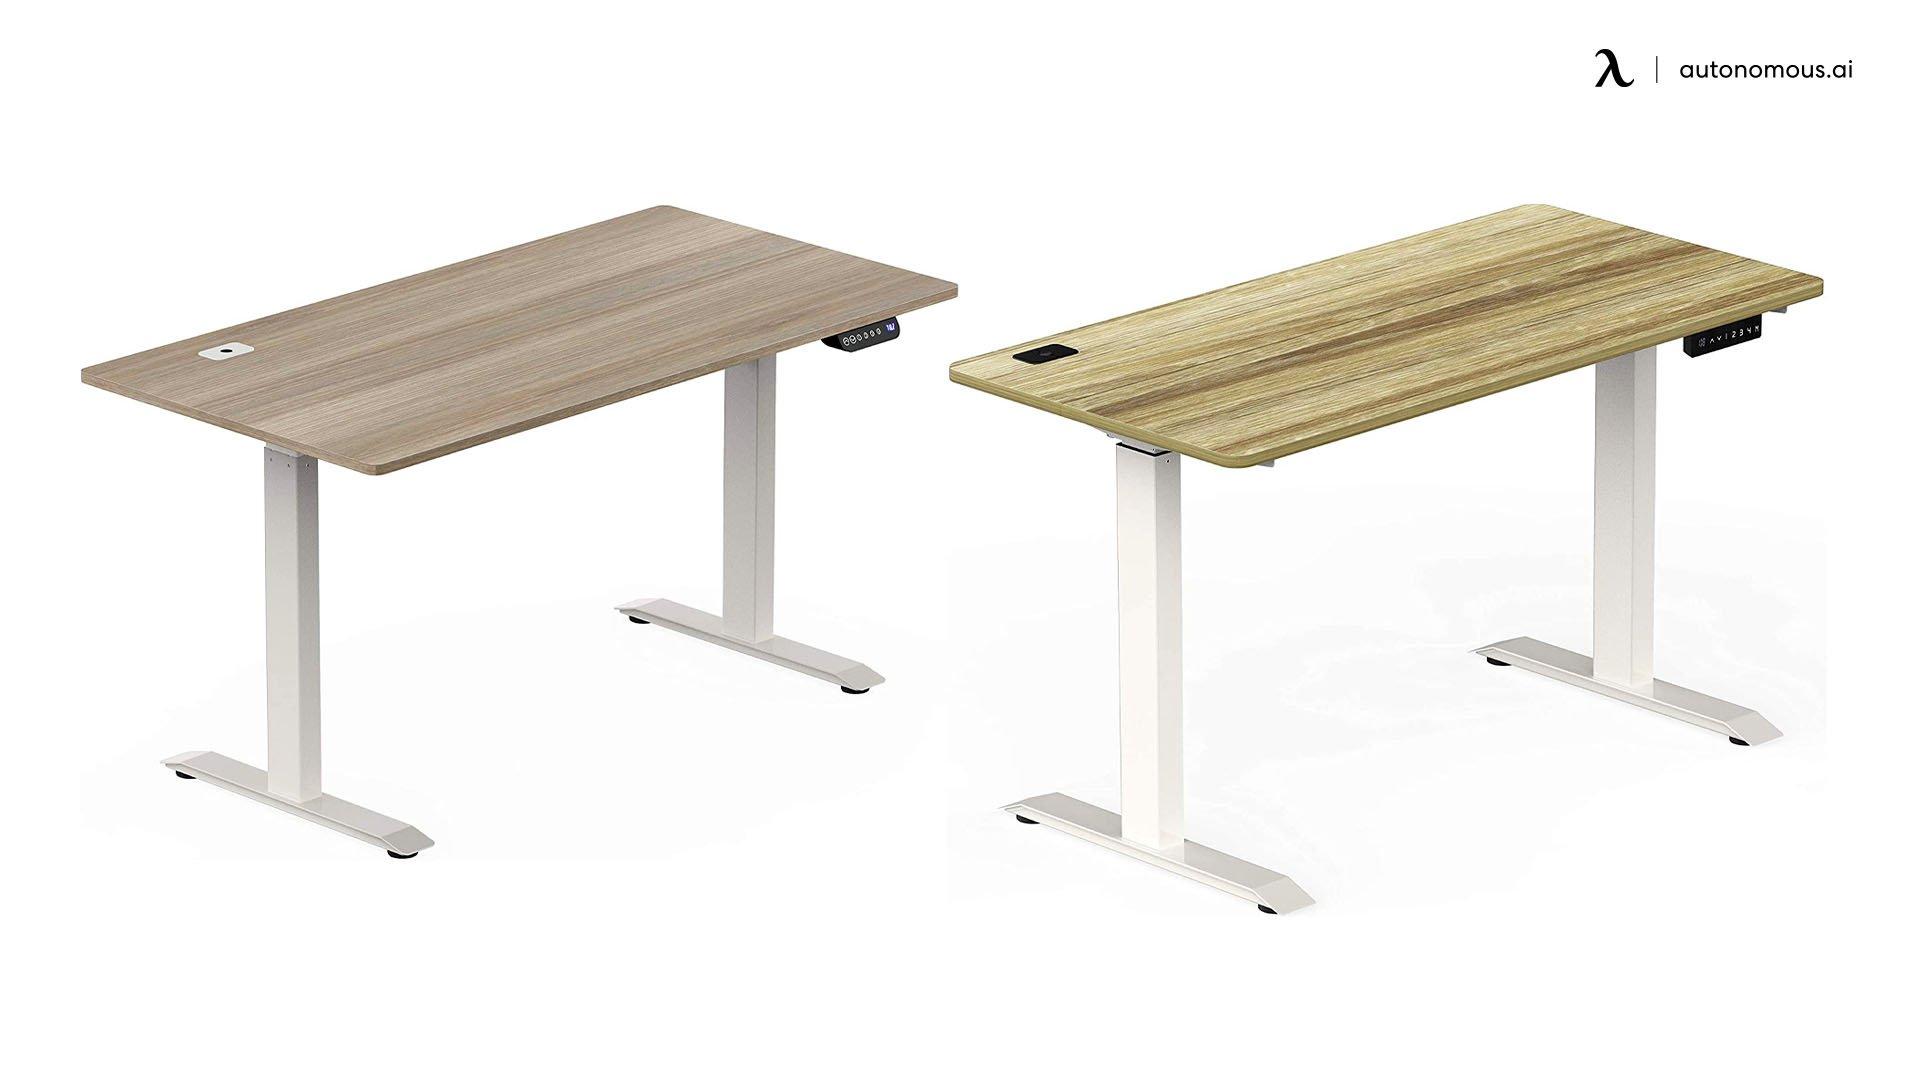 SHW Eelectric Height Adjustable Desk